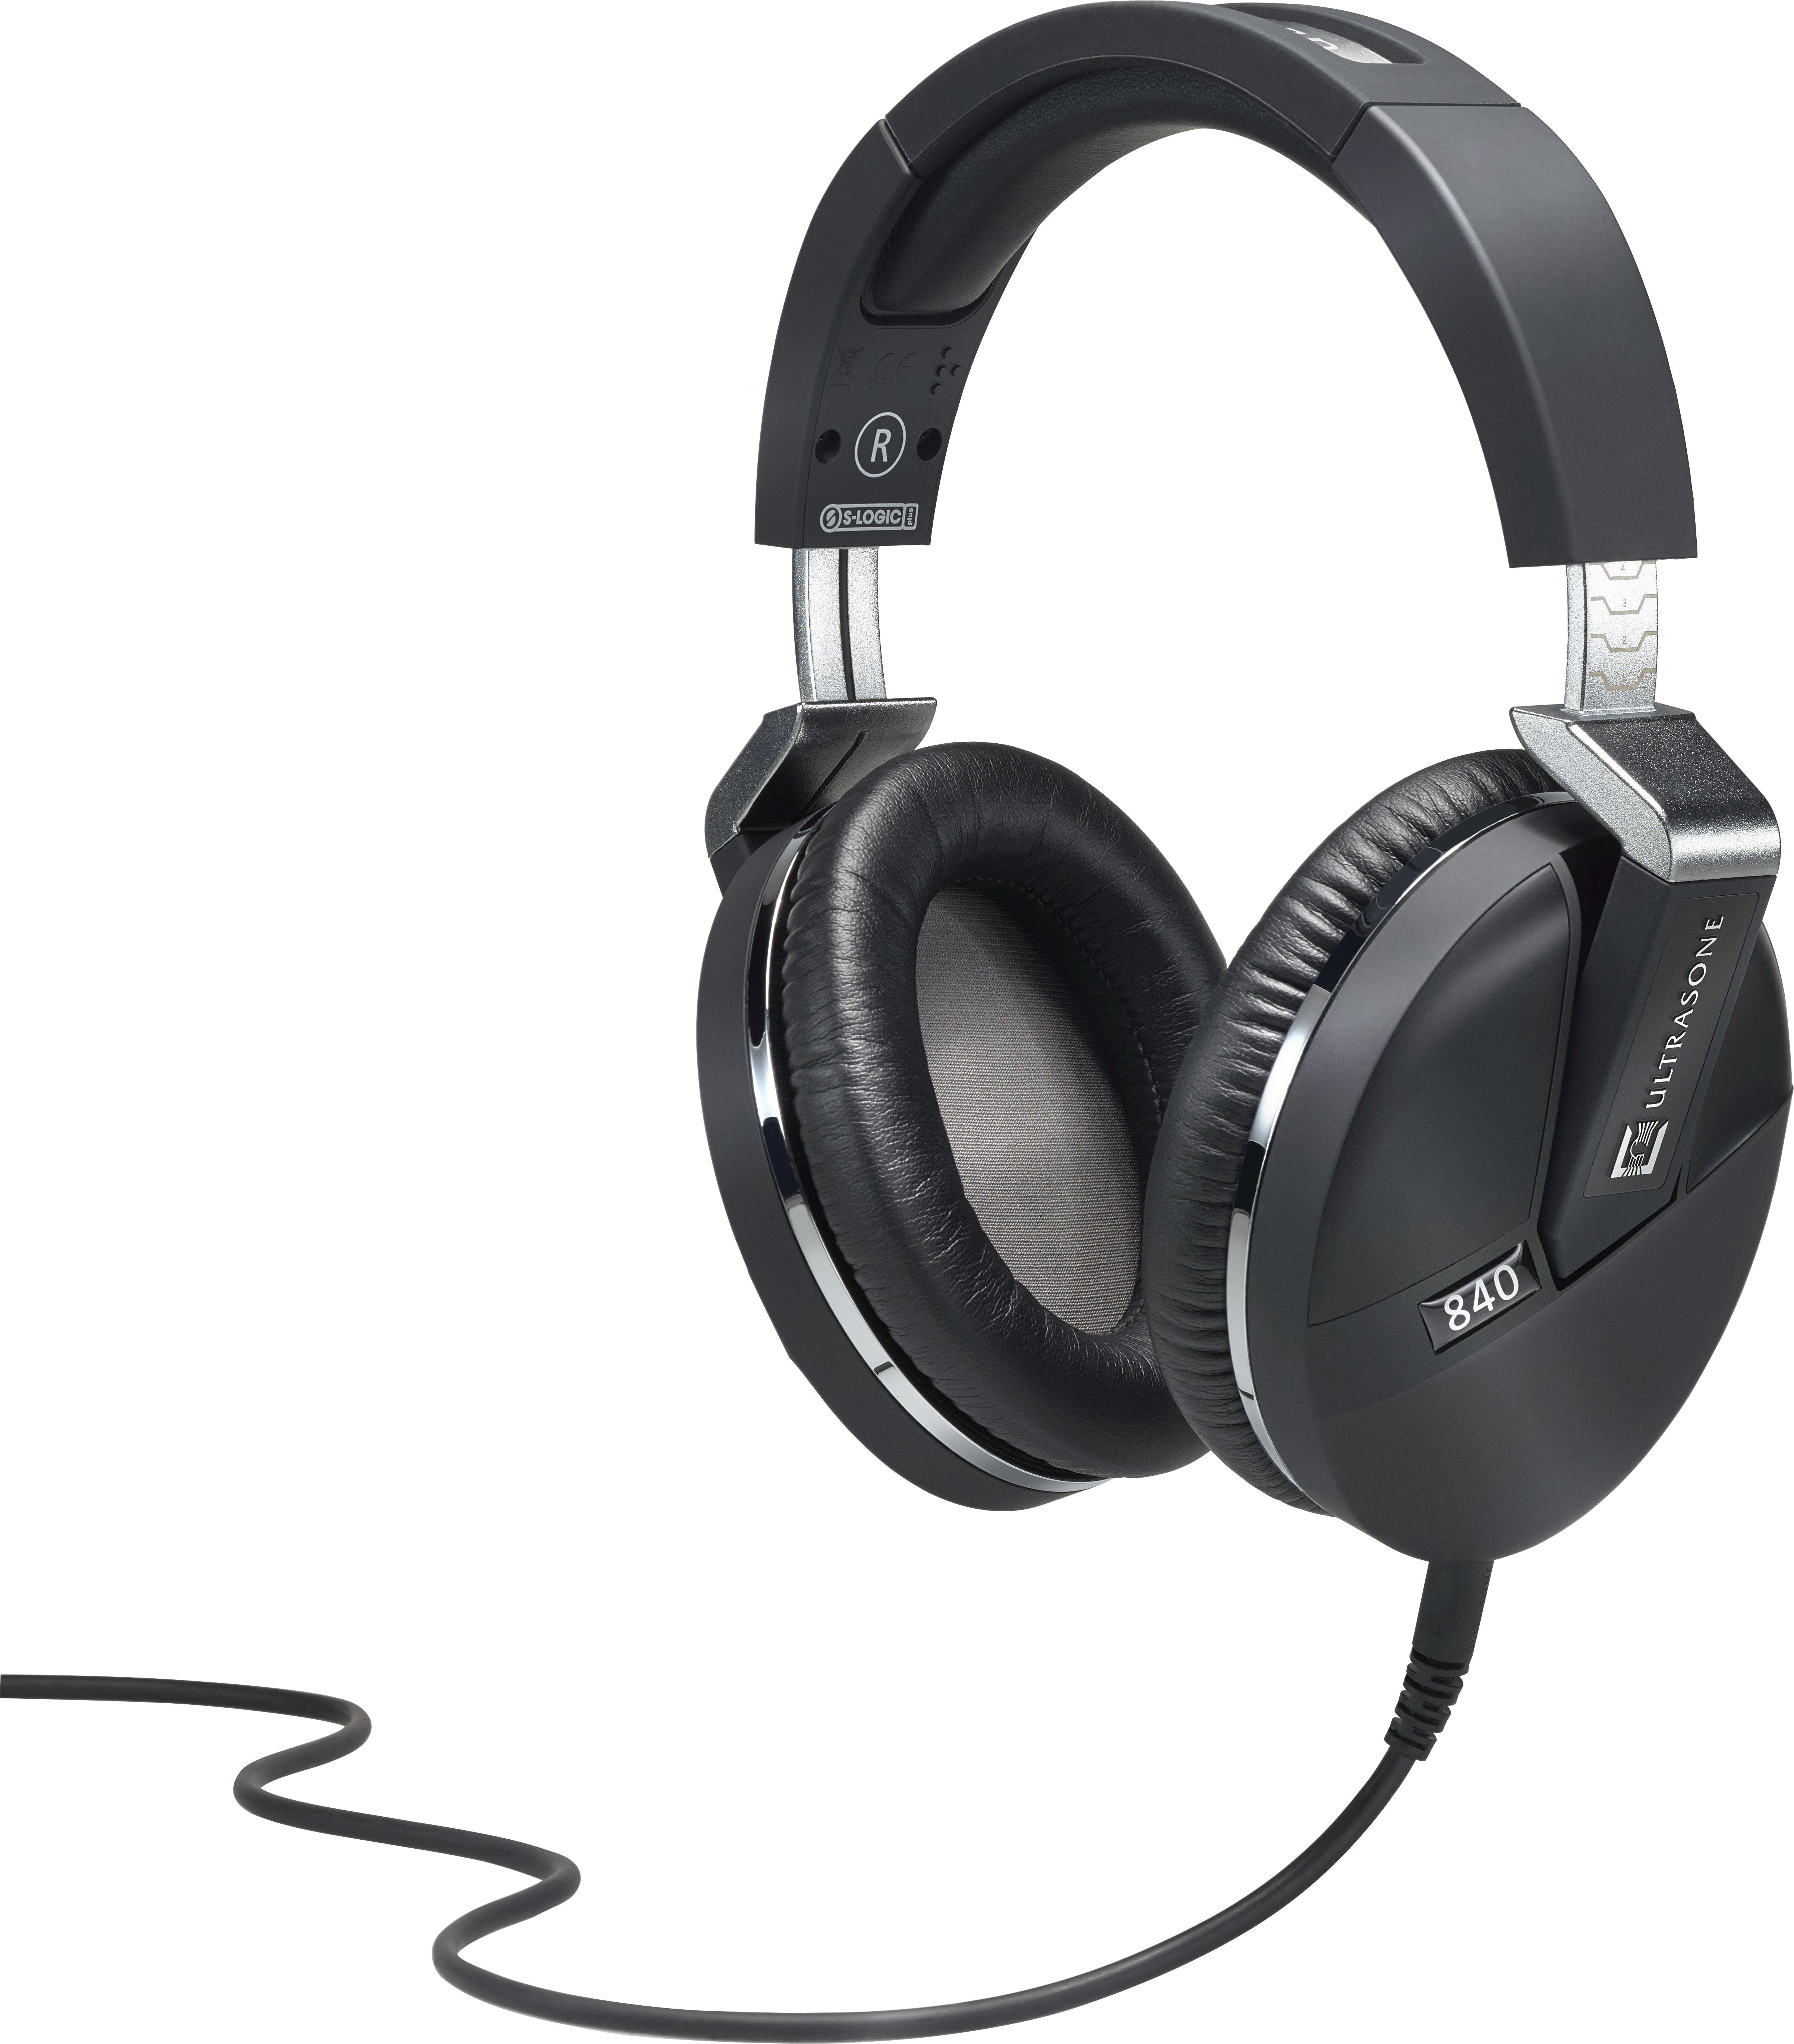 audio - CASQUES, ECOUTEURS, EAR MONITOR - CASQUES - ULTRASONE - ULTPER840 - Royez Musik